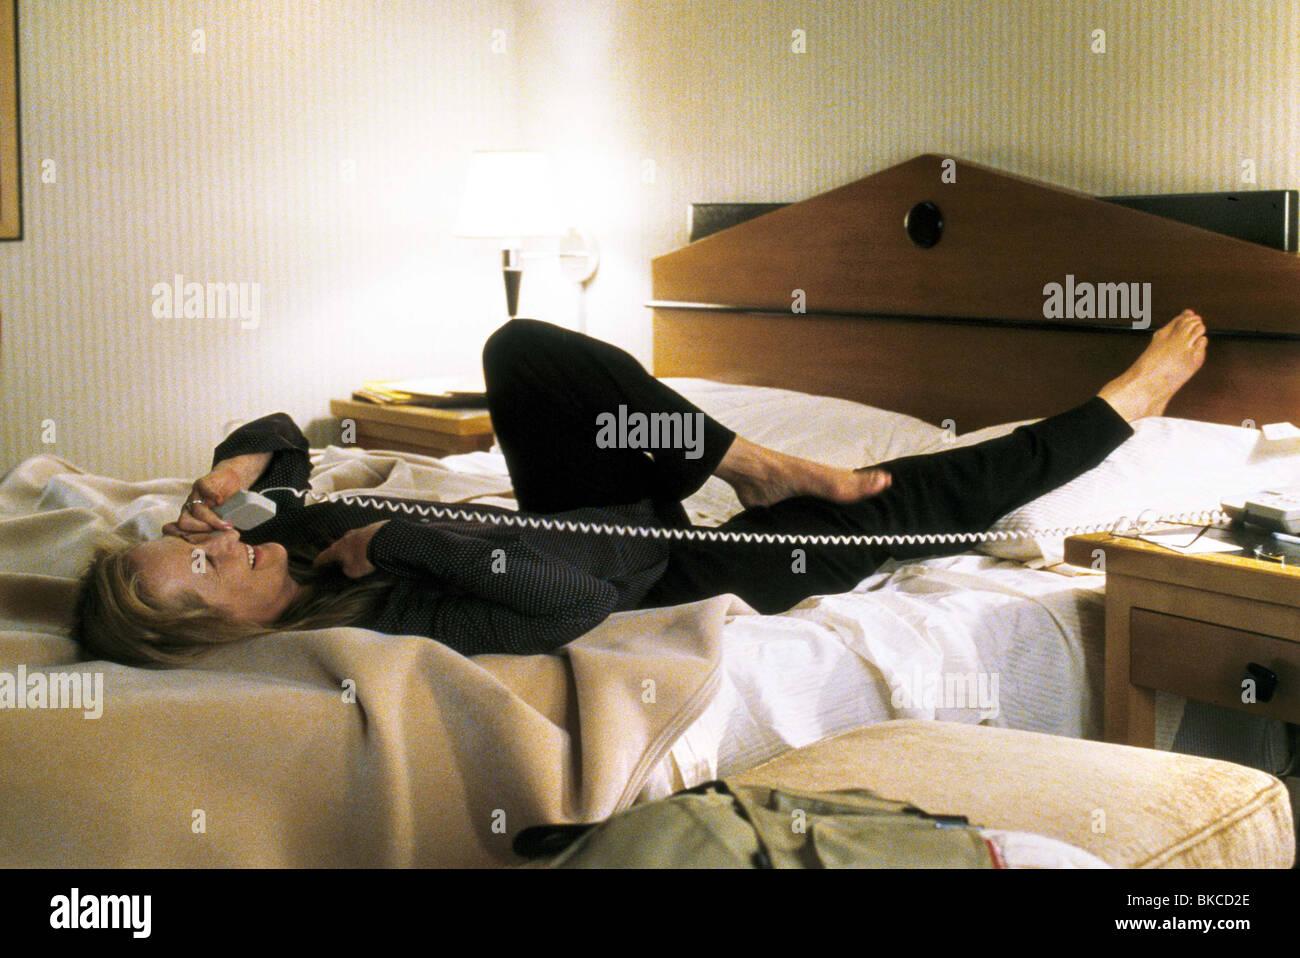 ADAPTATION (2002) MERYL STREEP APTN 001 30 - Stock Image